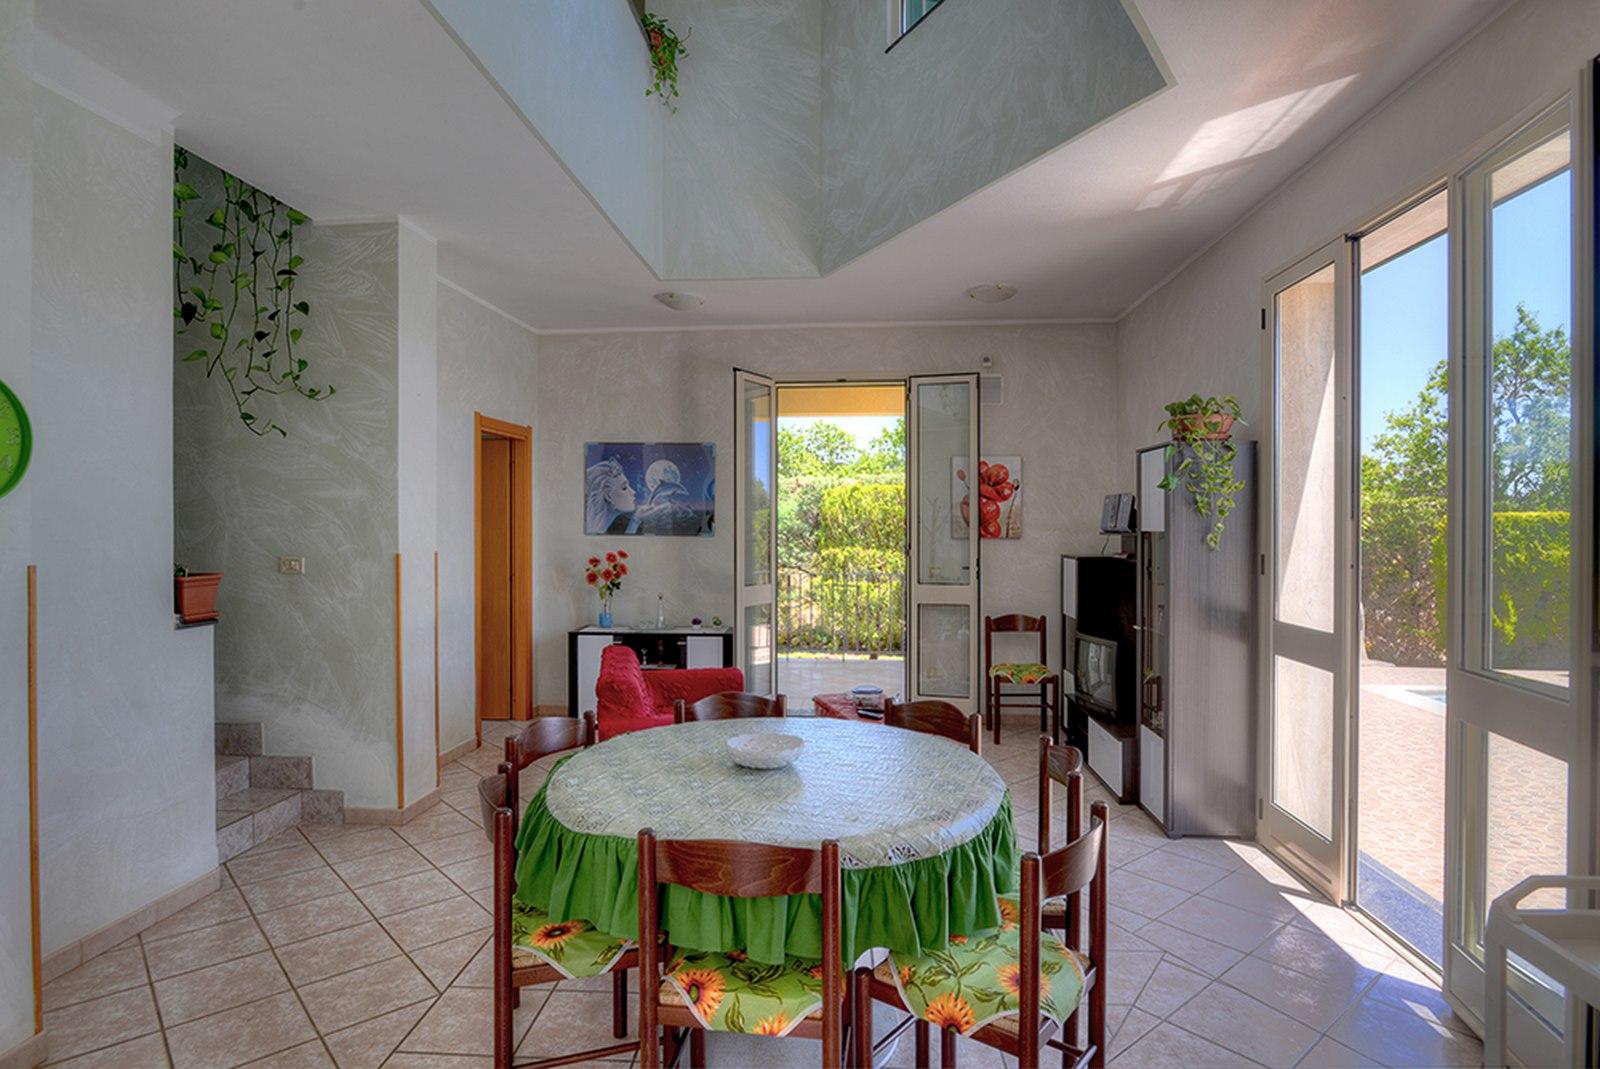 Maison de vacances Villa Paola (1041138), Floridia, Siracusa, Sicile, Italie, image 6